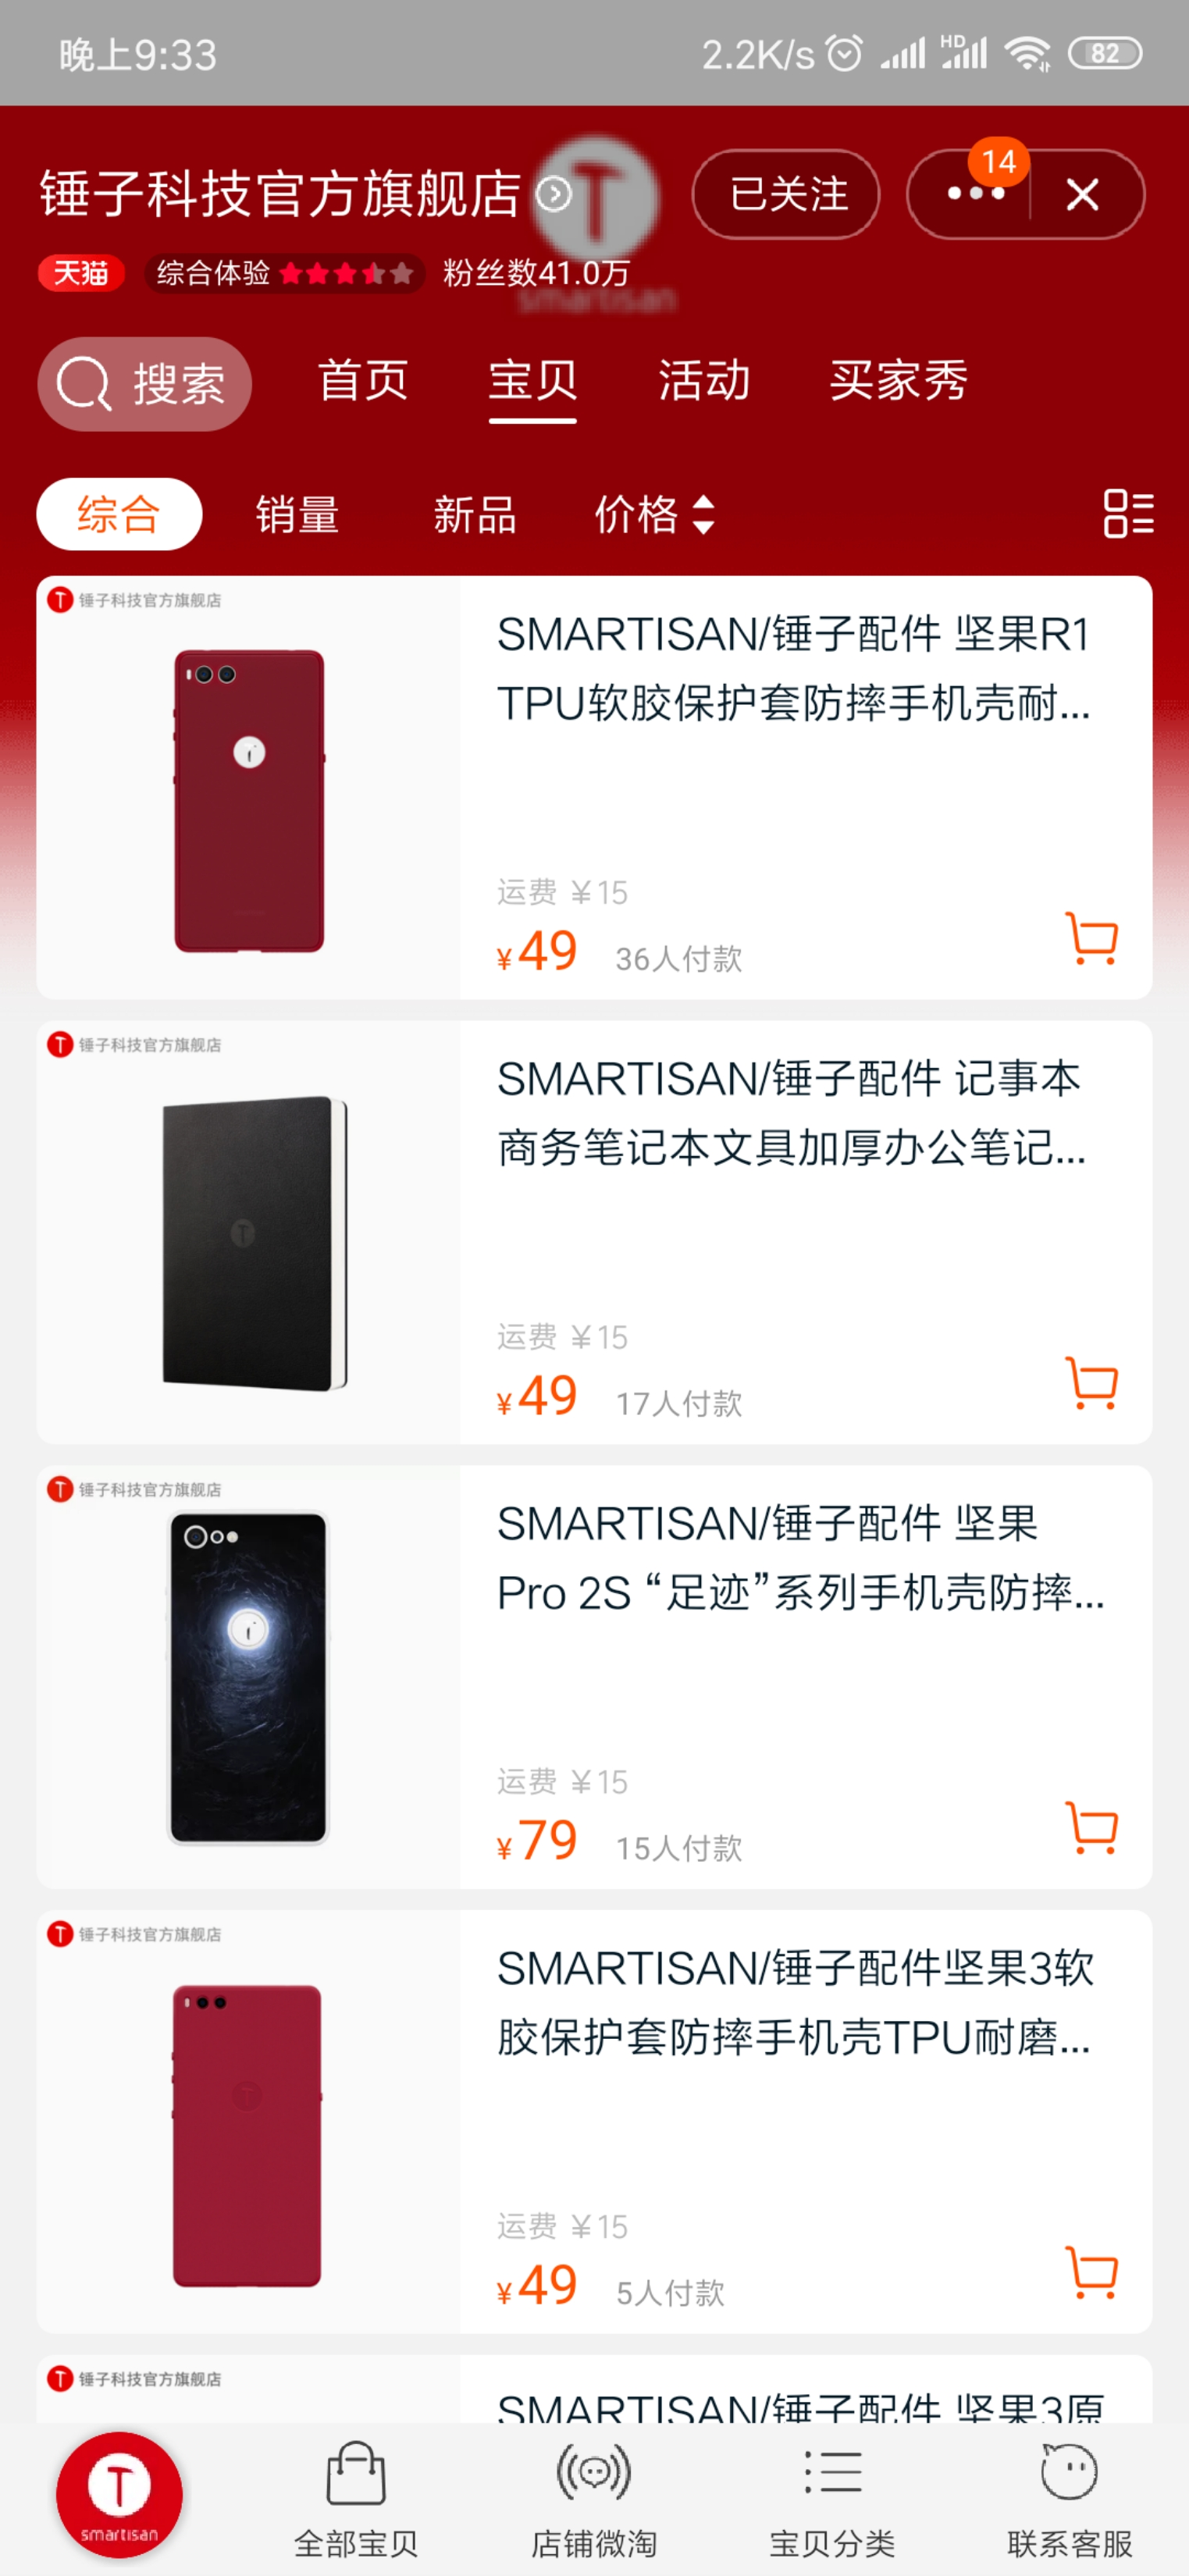 Screenshot_2019-02-08-21-33-01-928_com.taobao.taobao.png